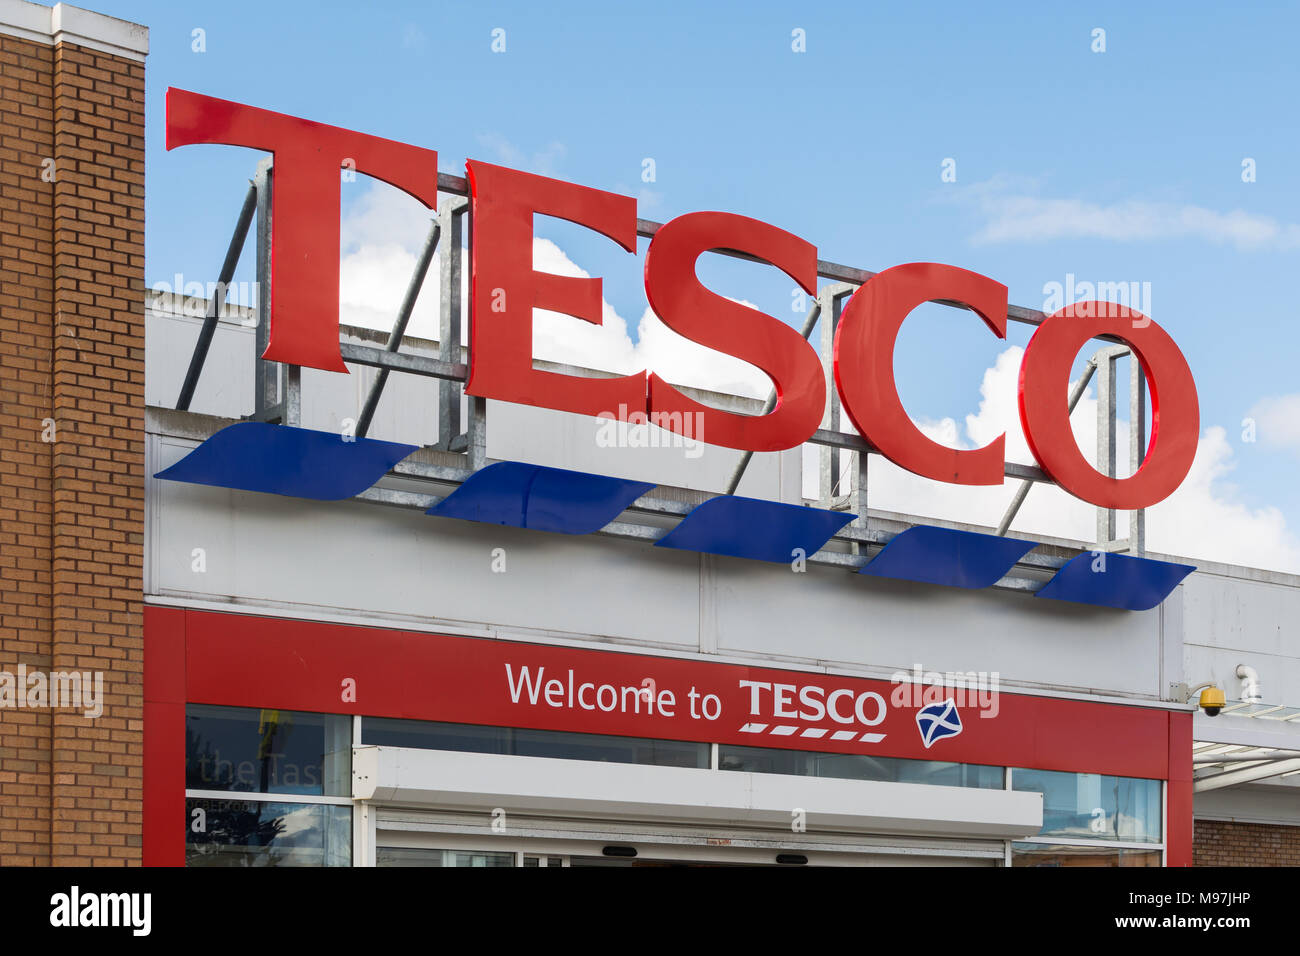 Tesco sign - Stock Image